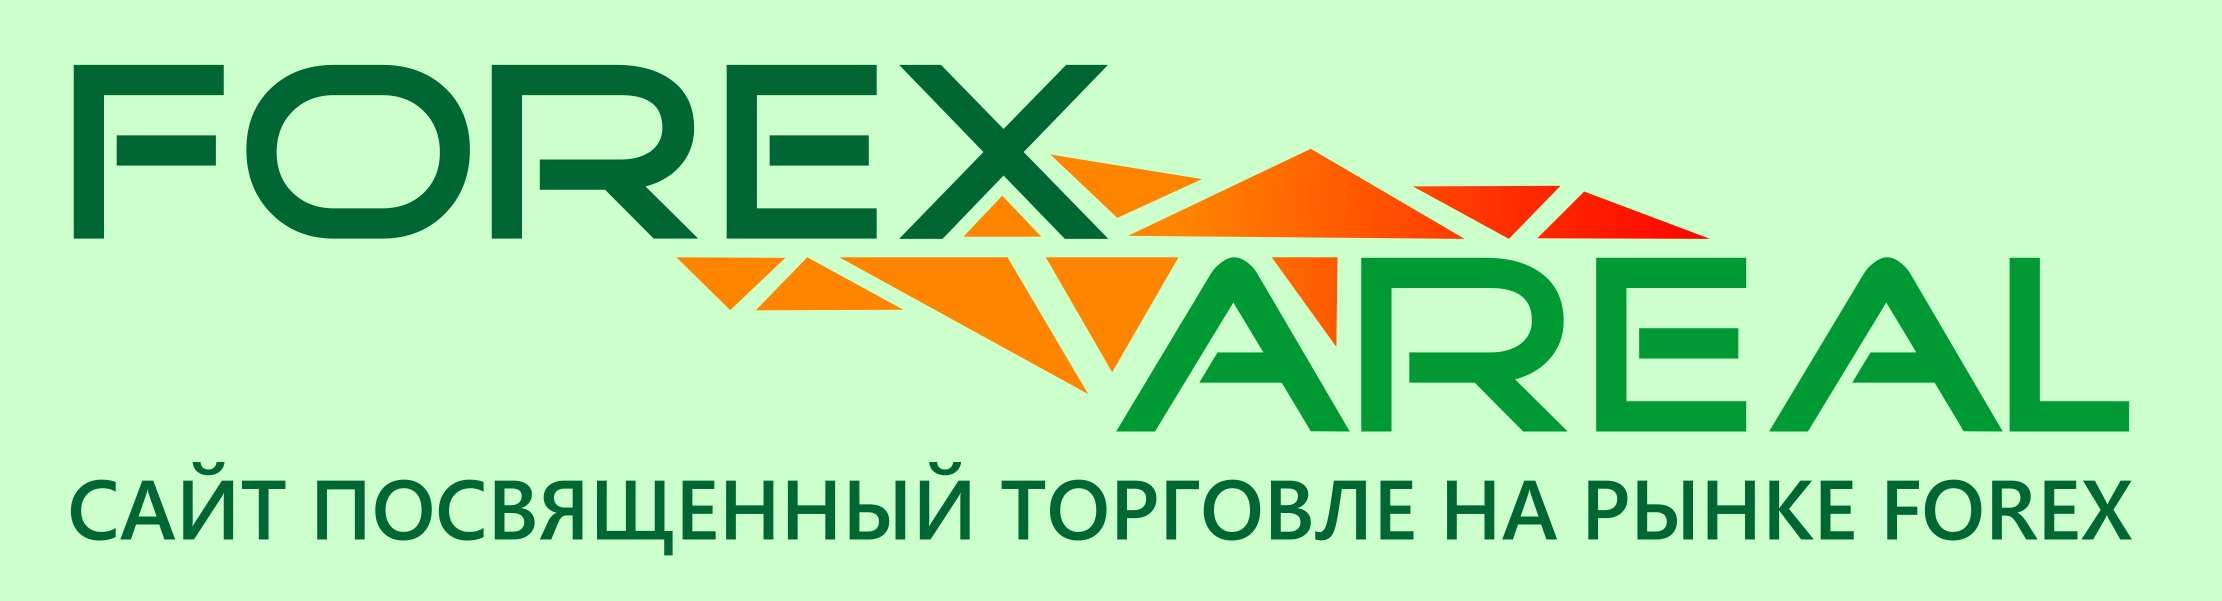 FOREX AREAL – Торговля на рынке Forex